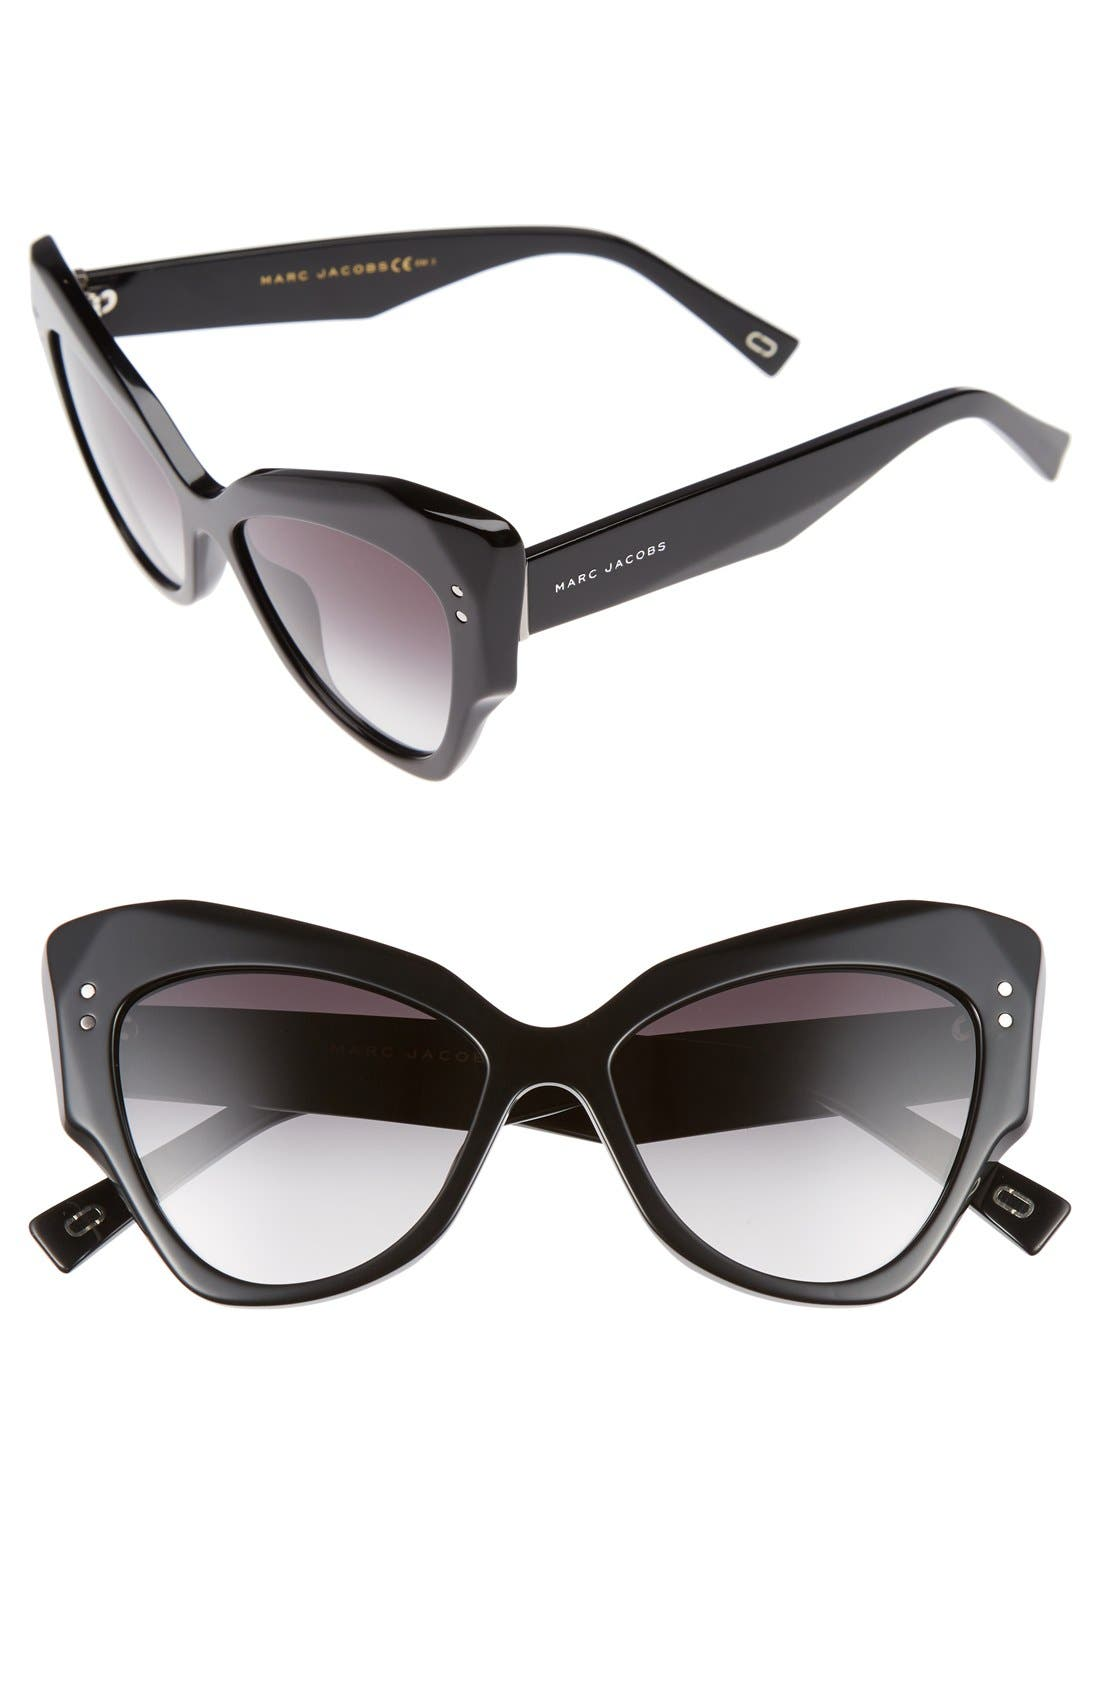 52mm Cat Eye Sunglasses,                         Main,                         color, 001